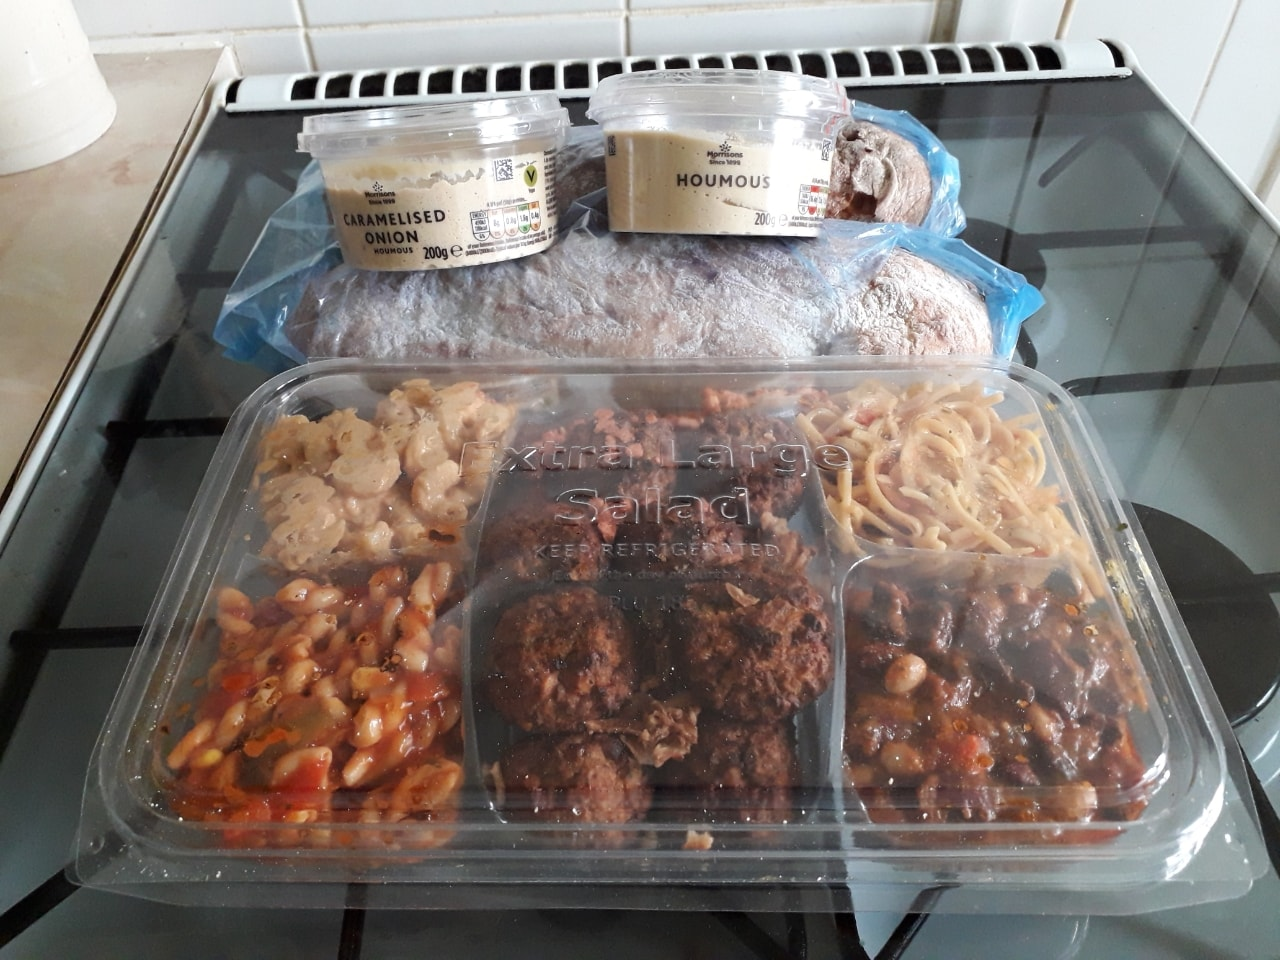 Falafel, pasta salads hummus  and ciabatta